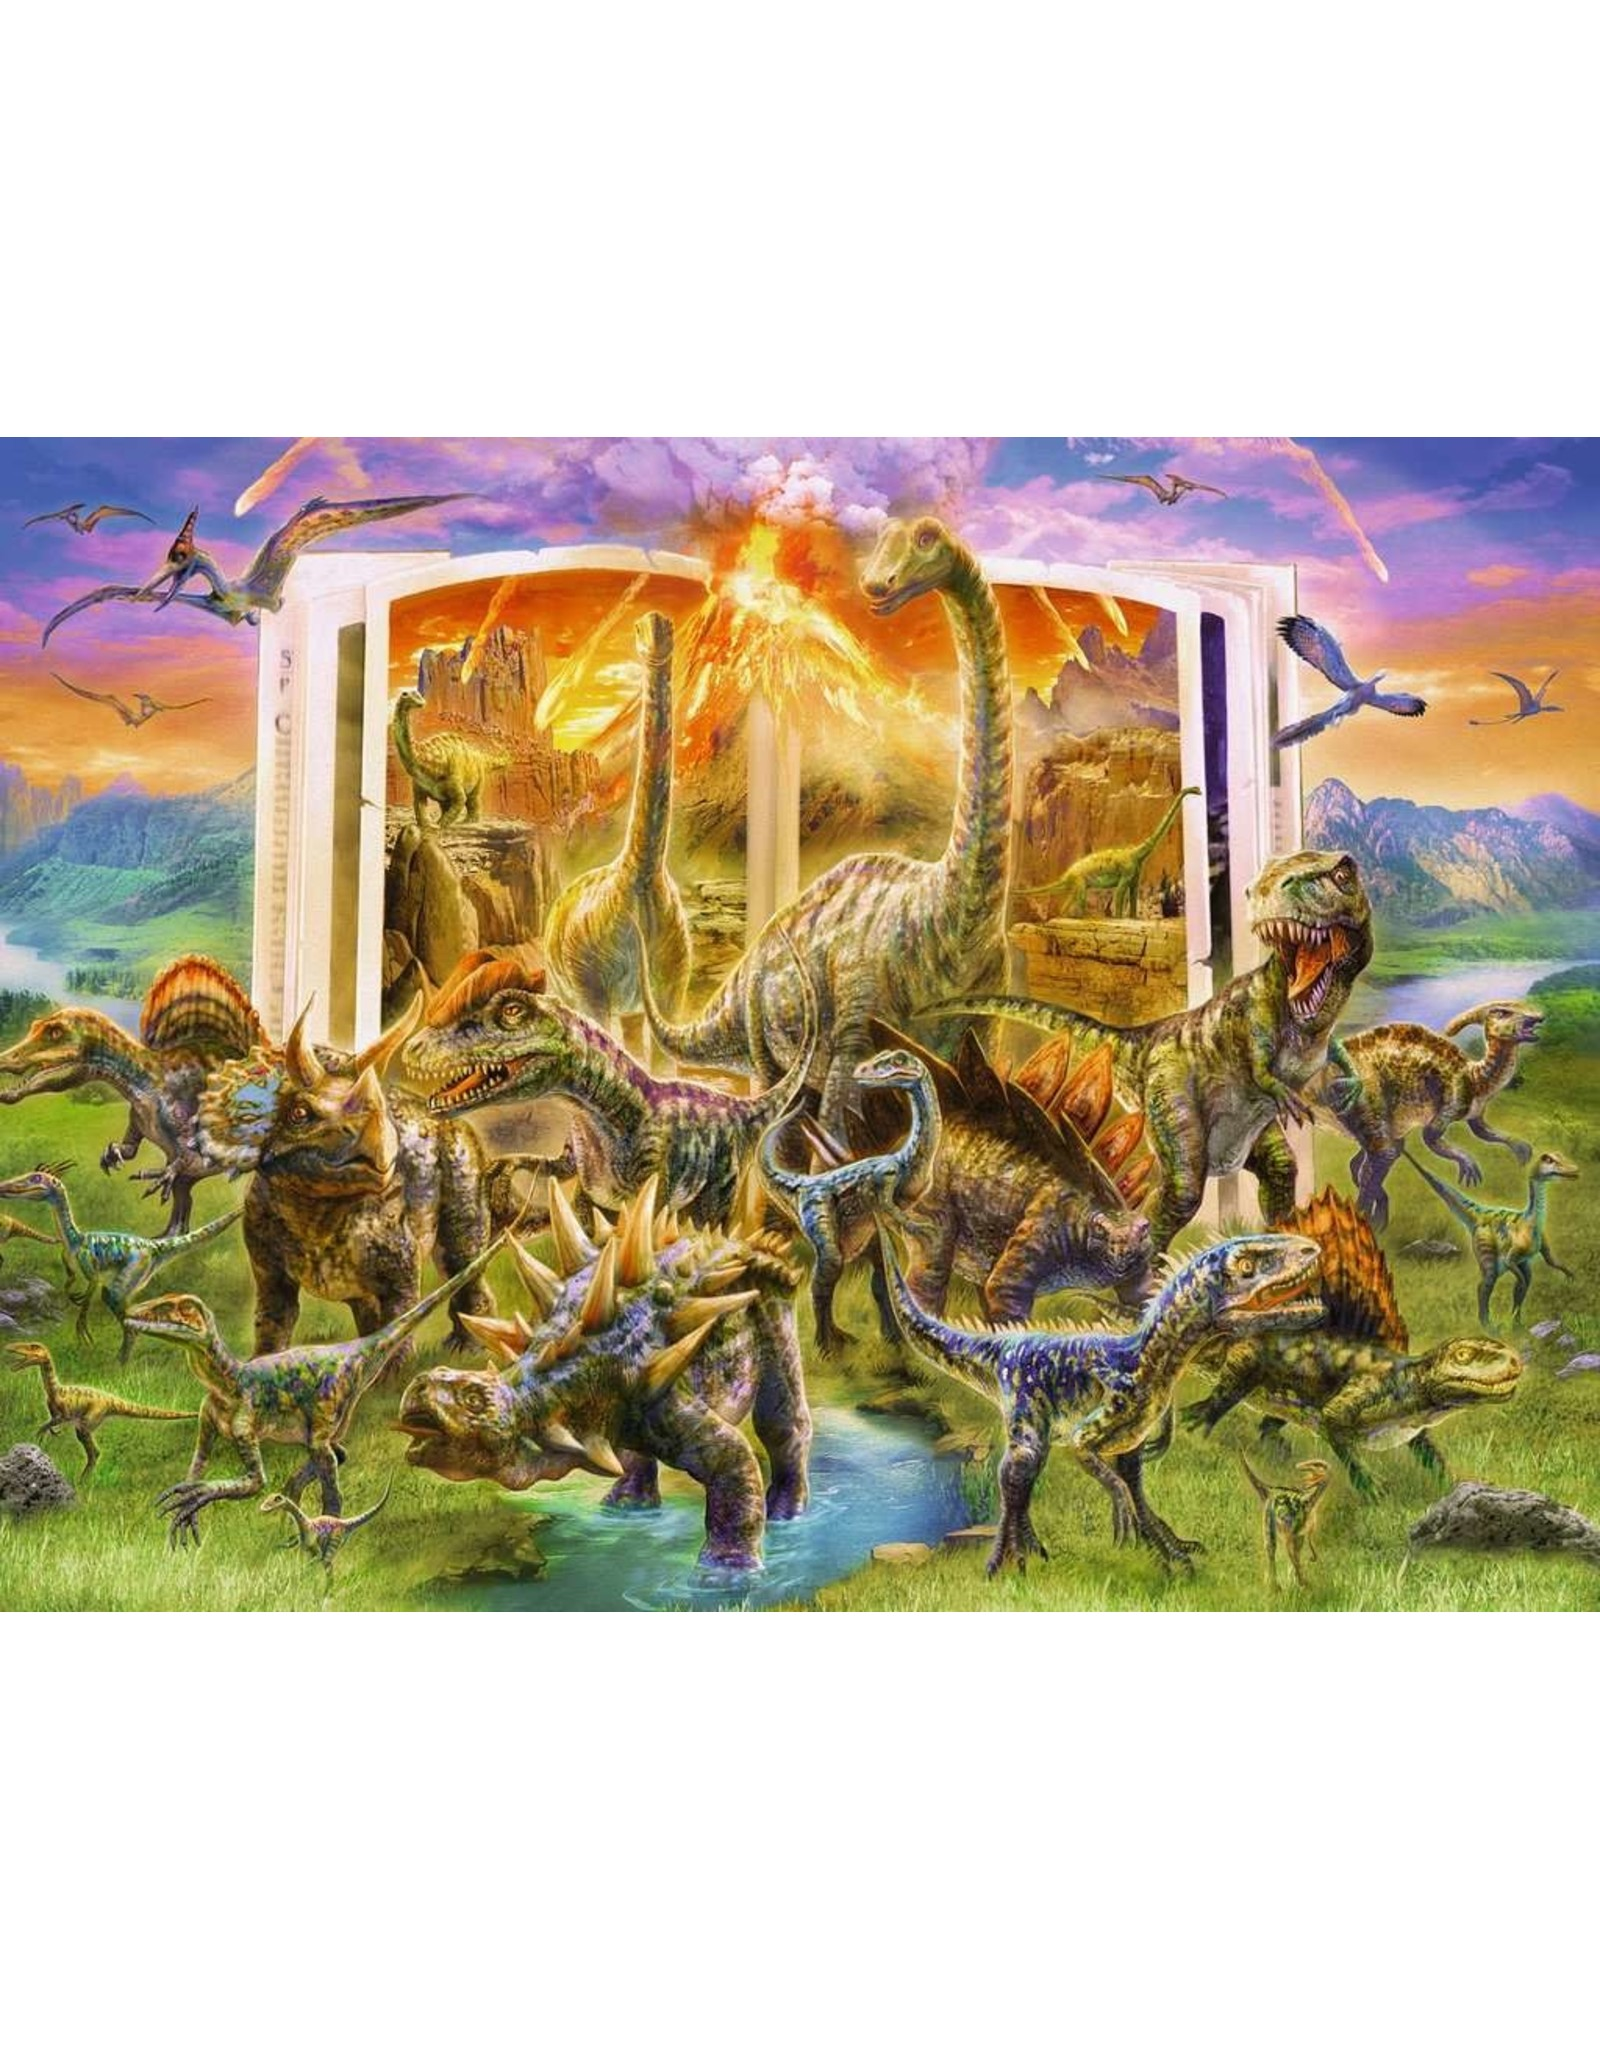 Ravensburger 300 pcs. Dinosaur Dictionary Puzzle